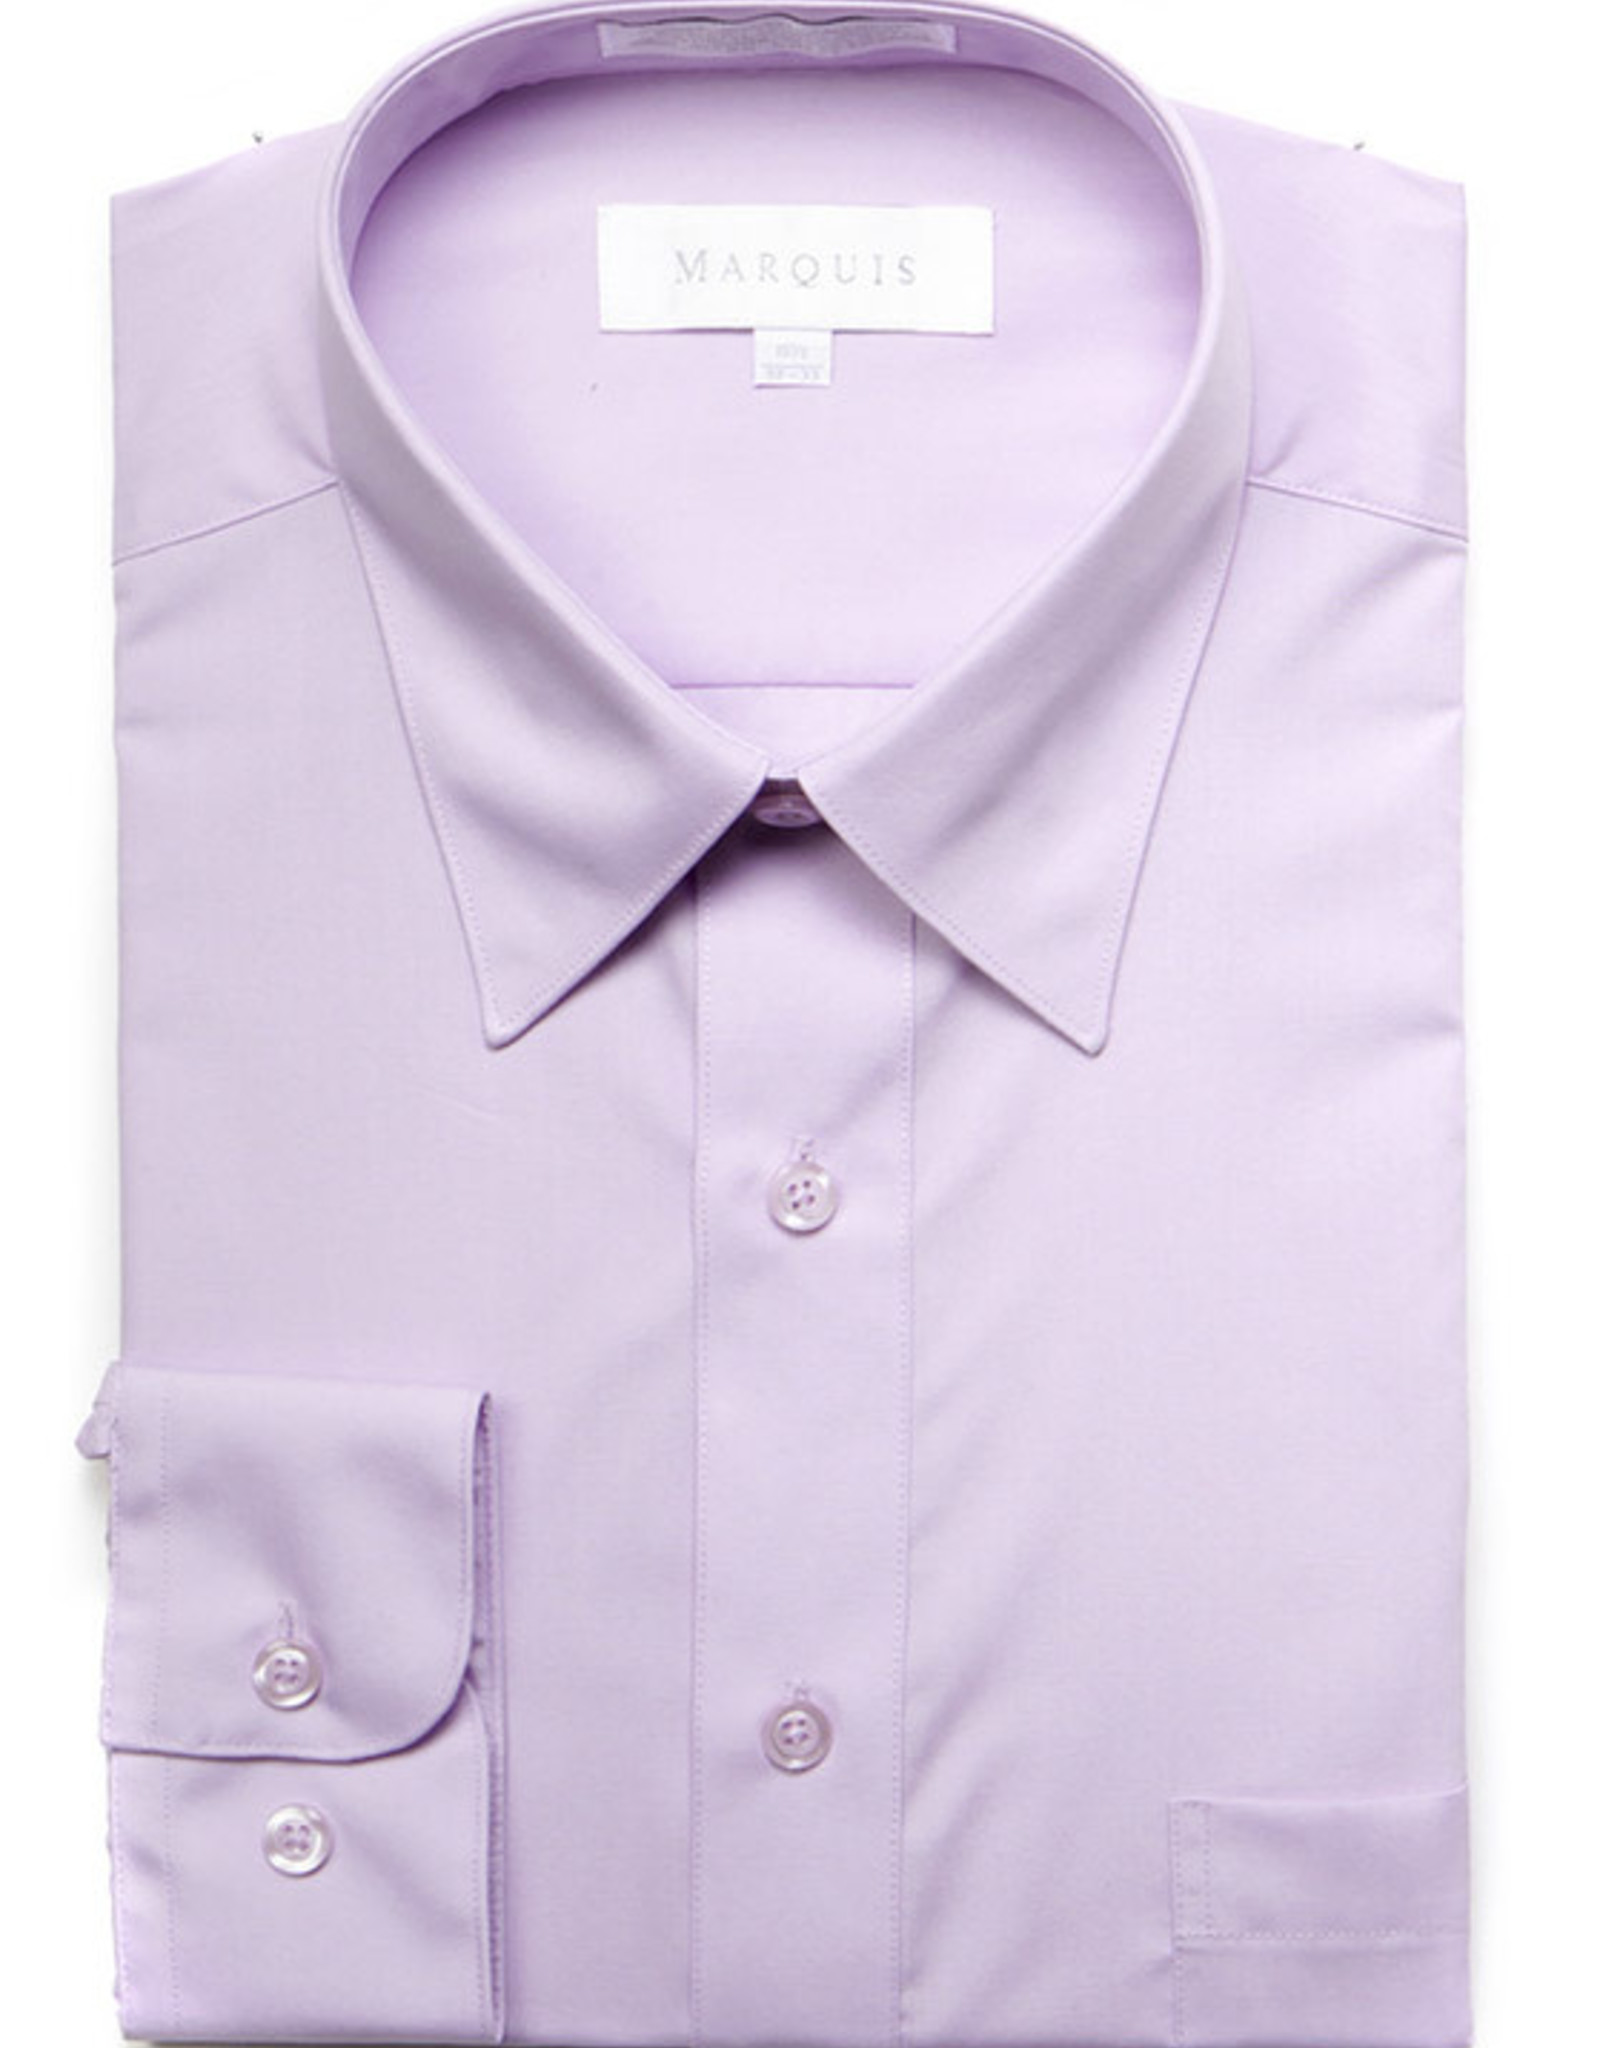 Marquis Dress Shirt MarQuis Regular Fit Lilac